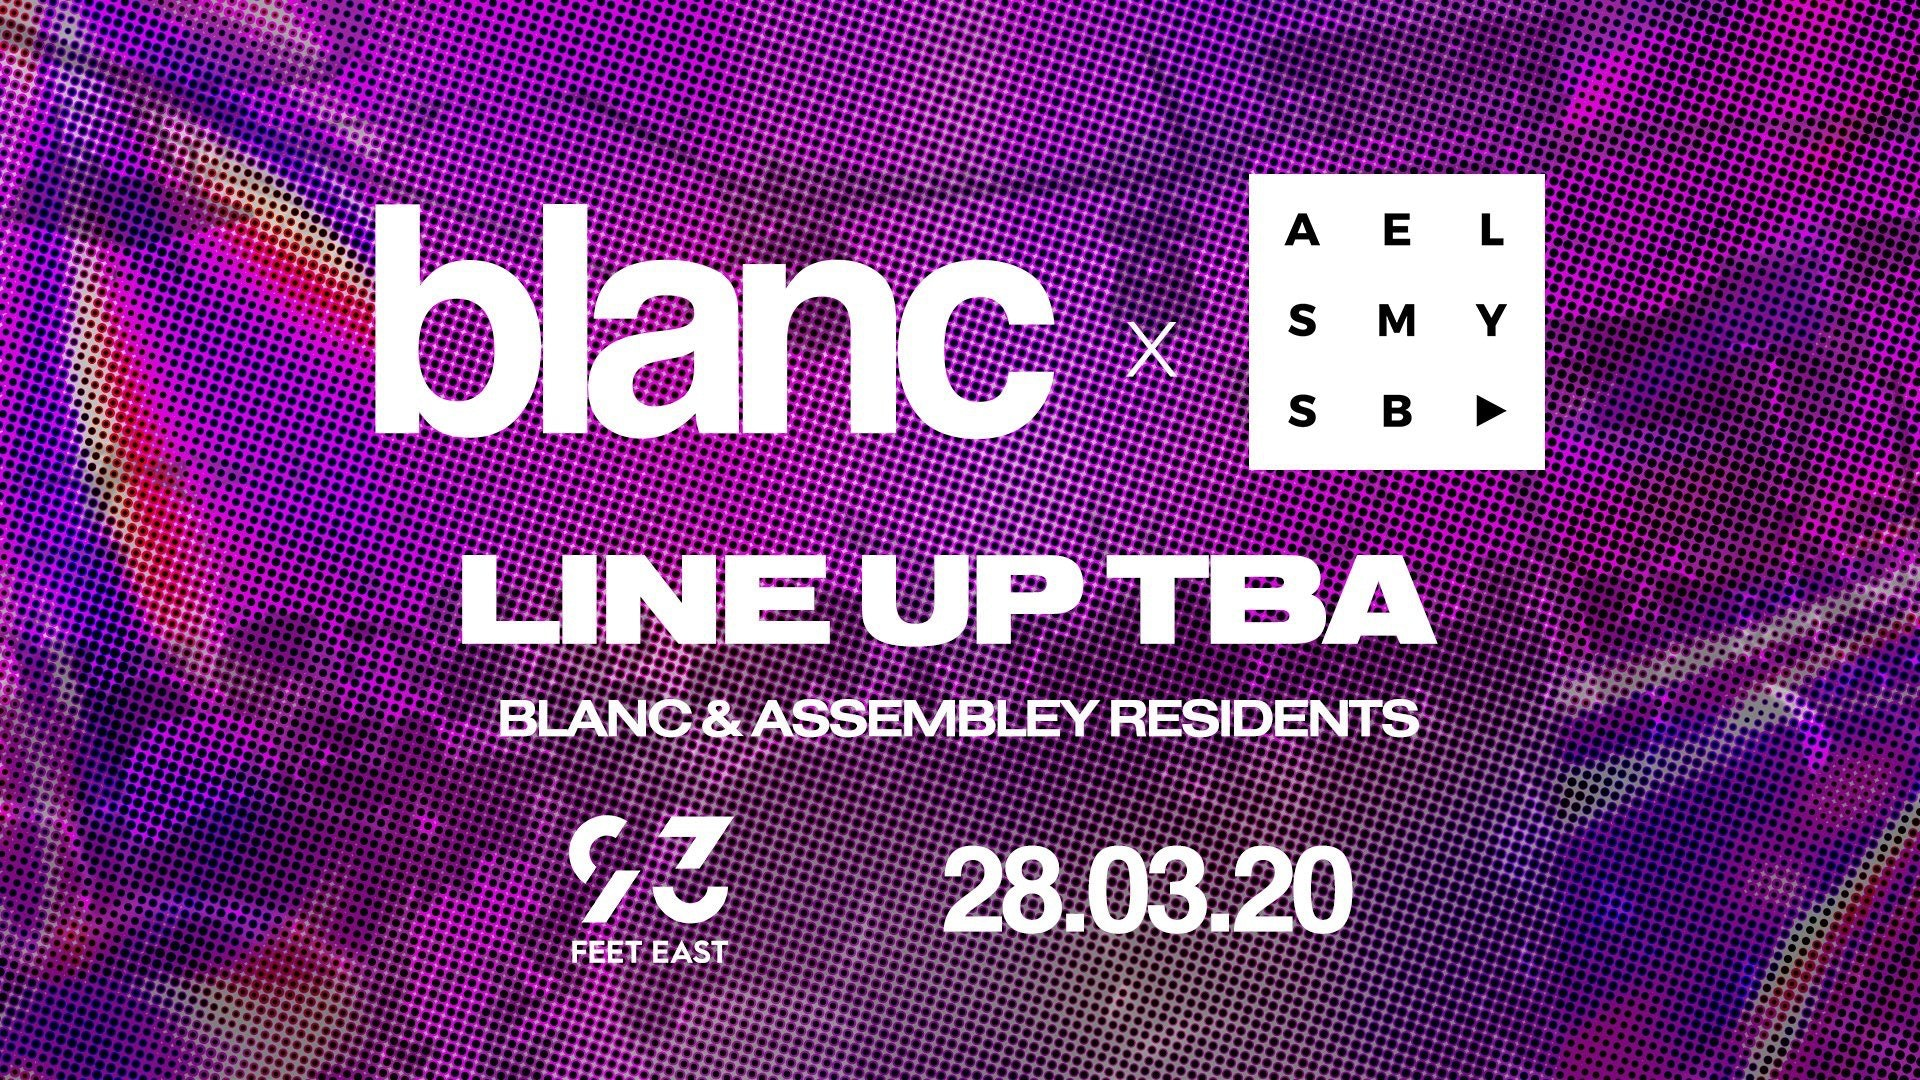 Blanc London launch party